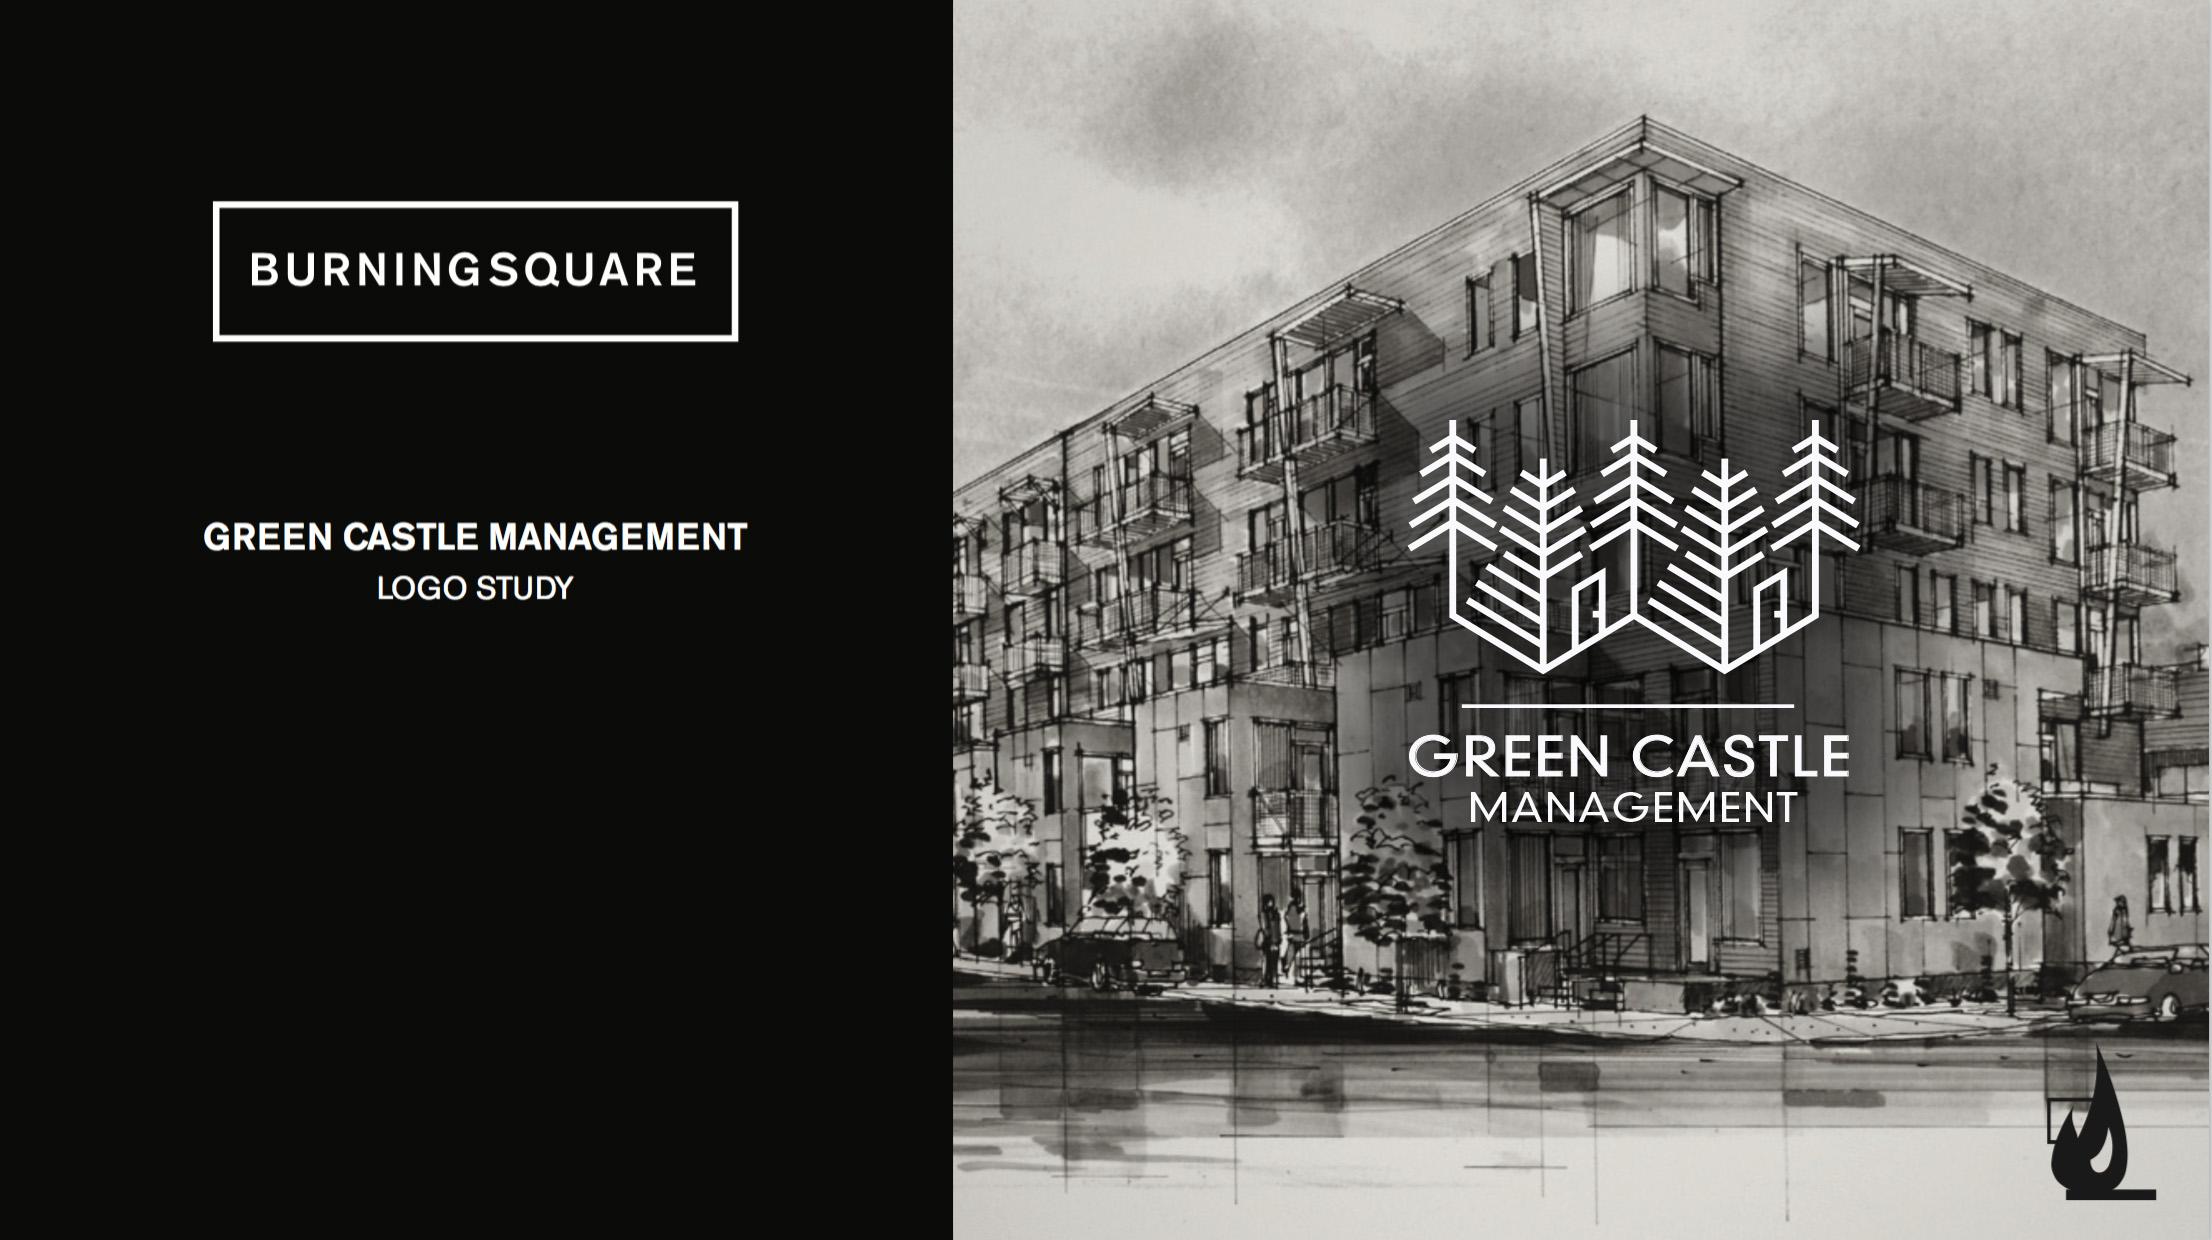 GCM featured image